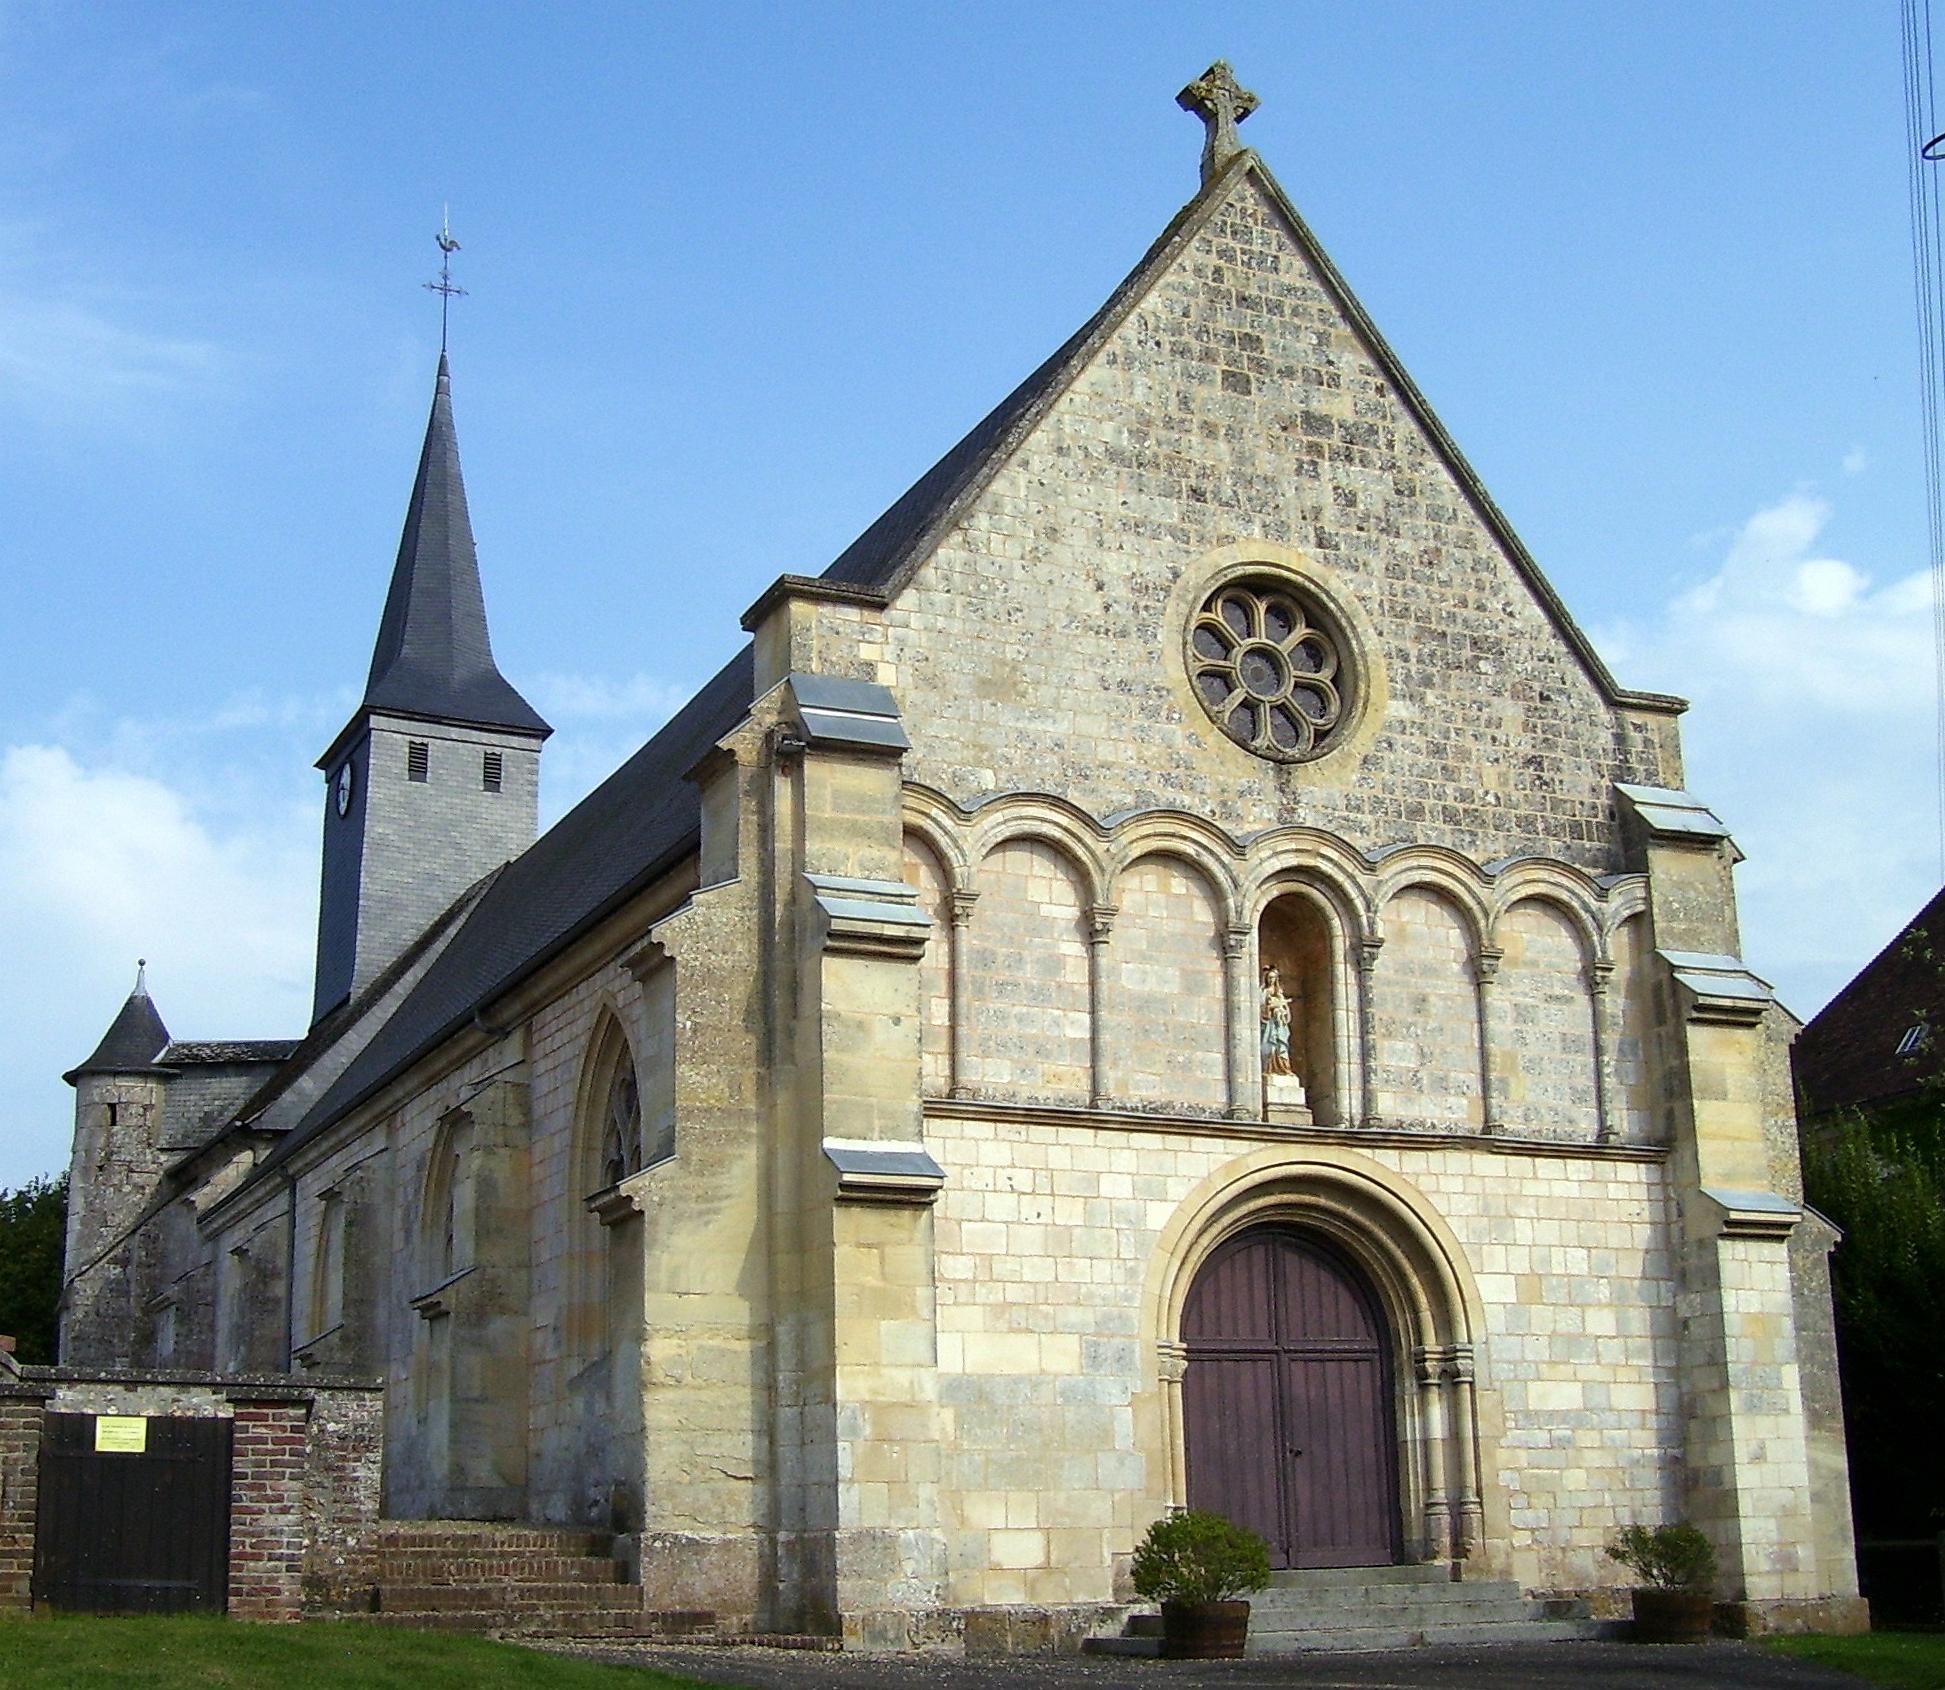 Eingang der Kirche, eigenes Foto (auf commons), Lizenz:public domain/gemeinfrei